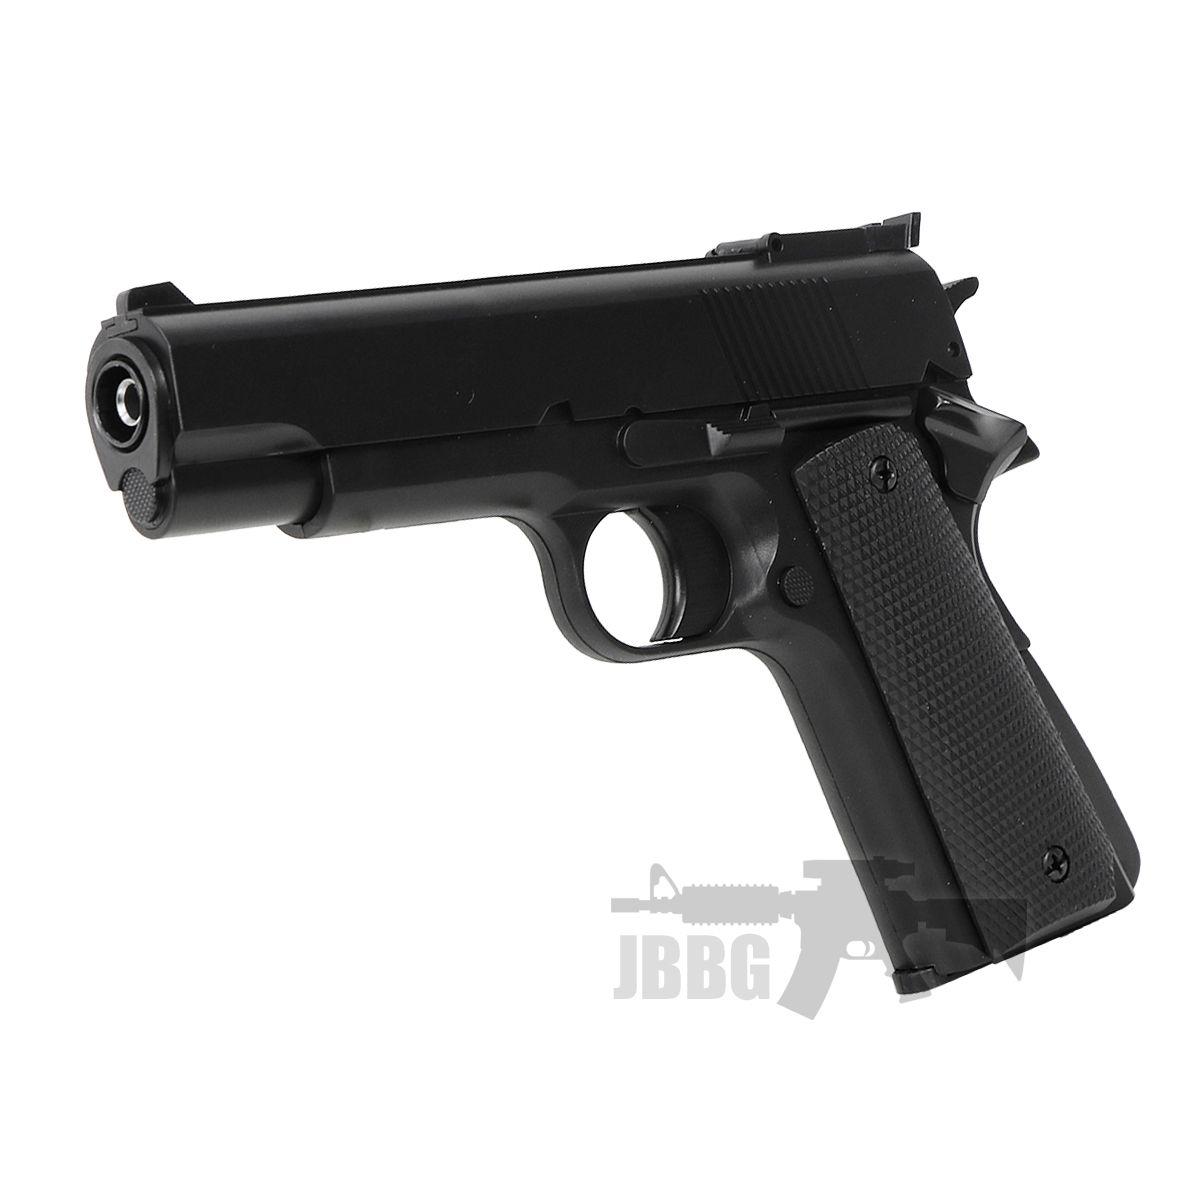 hg123 gas airsoft pistol 8